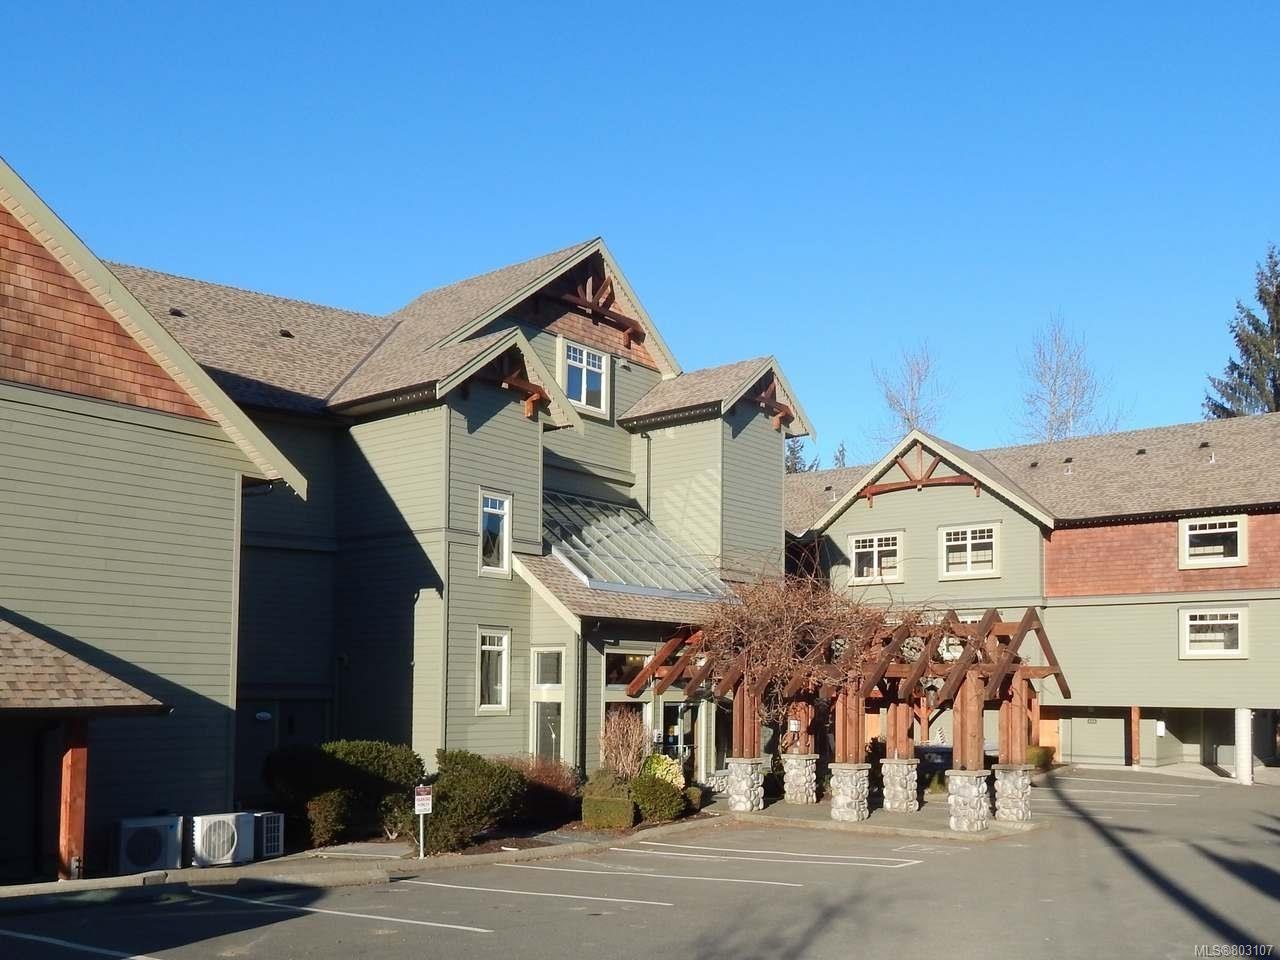 Main Photo: 107C 1800 Riverside Lane in COURTENAY: CV Courtenay City Condo Apartment for sale (Comox Valley)  : MLS®# 803107